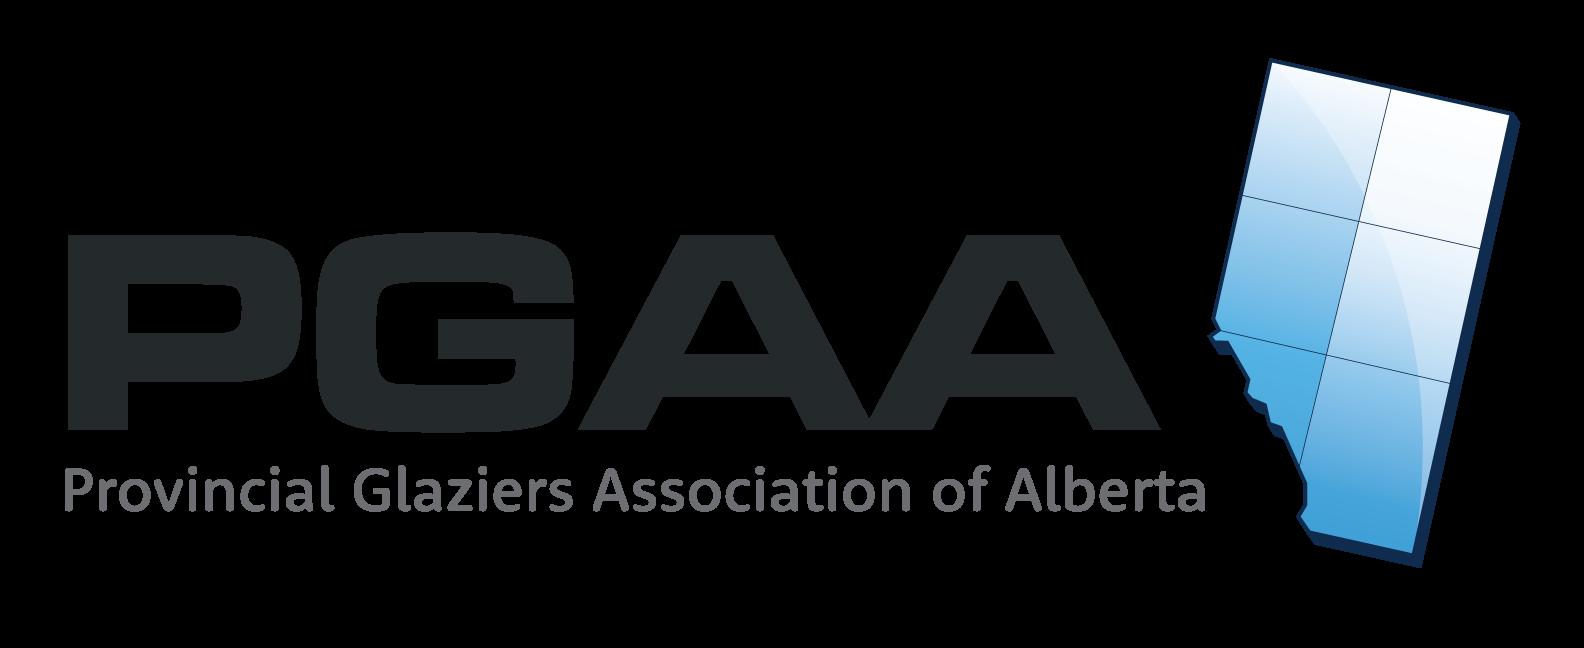 Logo for Provincial Glaziers Association of Alberta